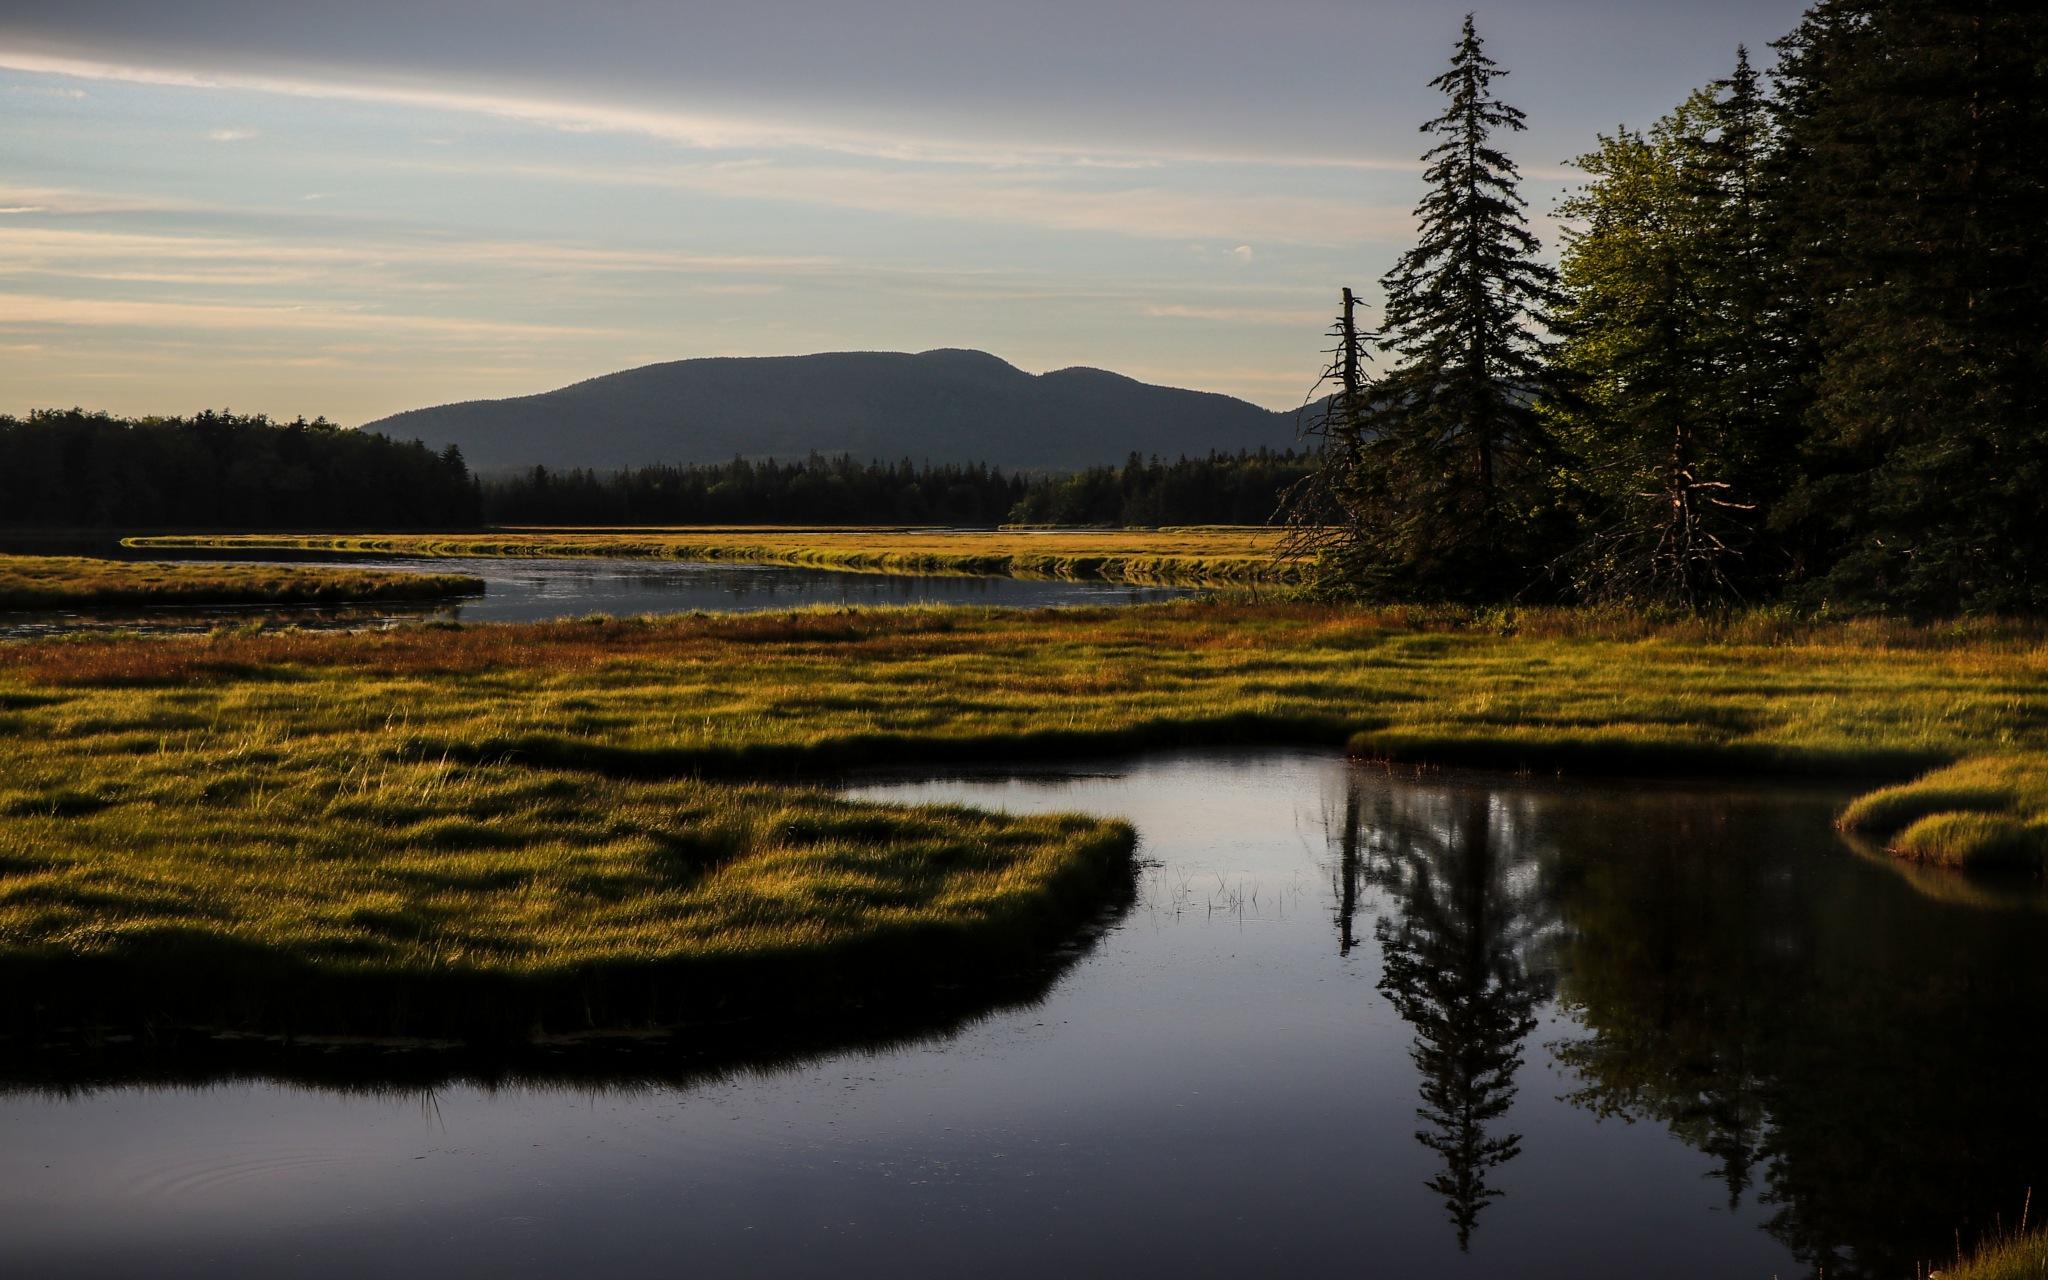 Peaceful reflection by Mark Hootman